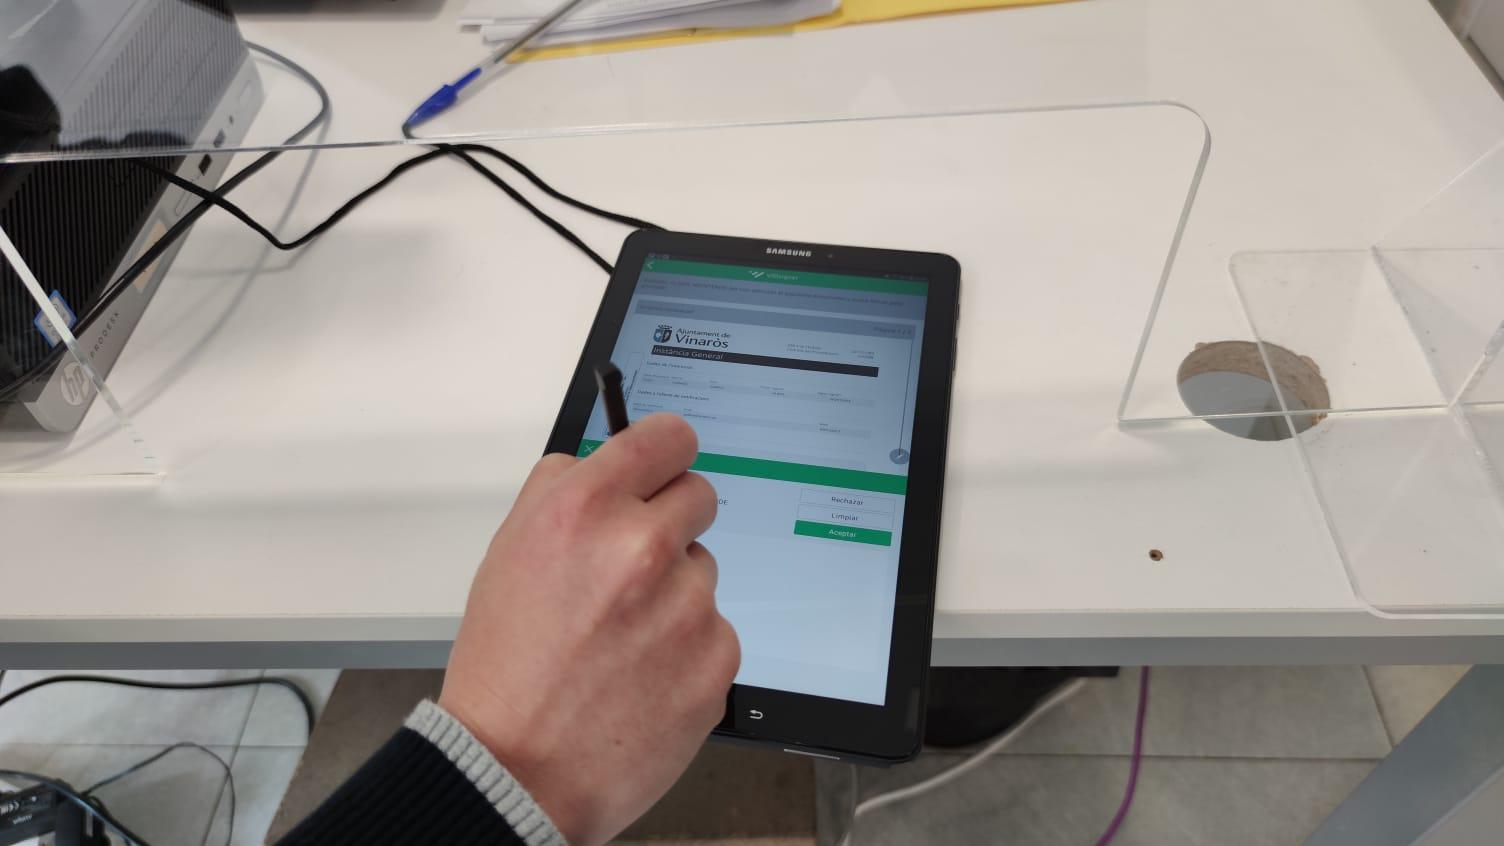 Vinaròs implanta el sistema de firma biomètrica a l'OIAC